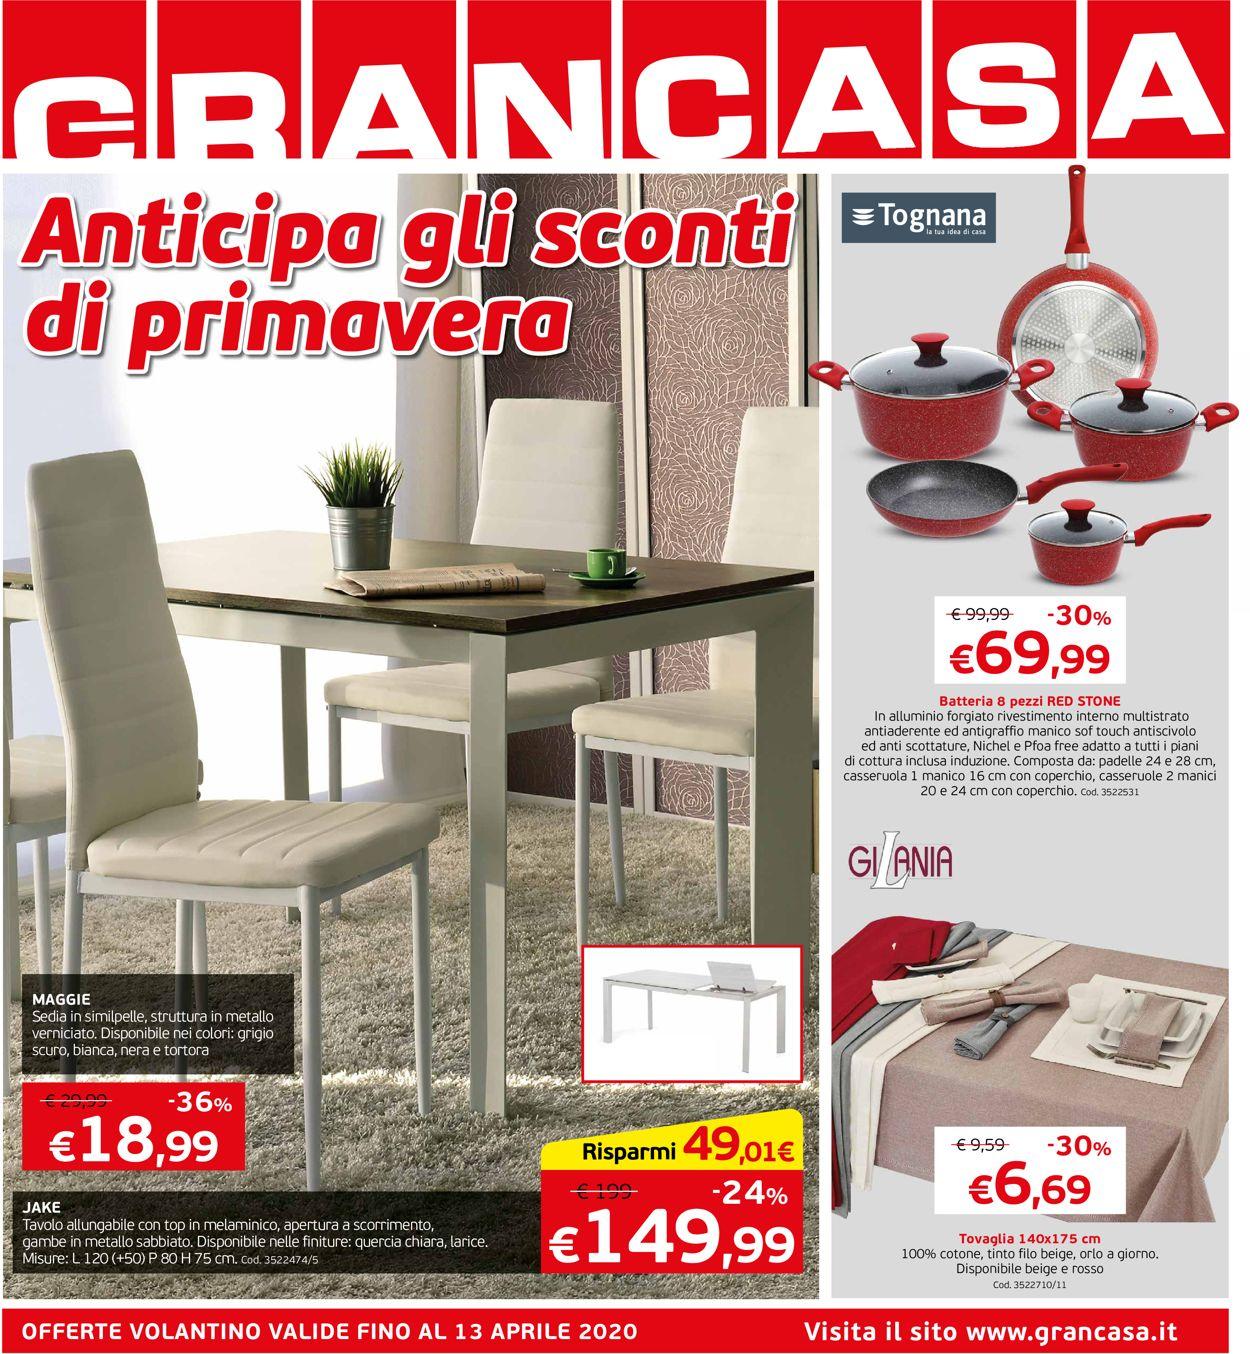 Volantino Grancasa - Offerte 06/04-13/04/2020